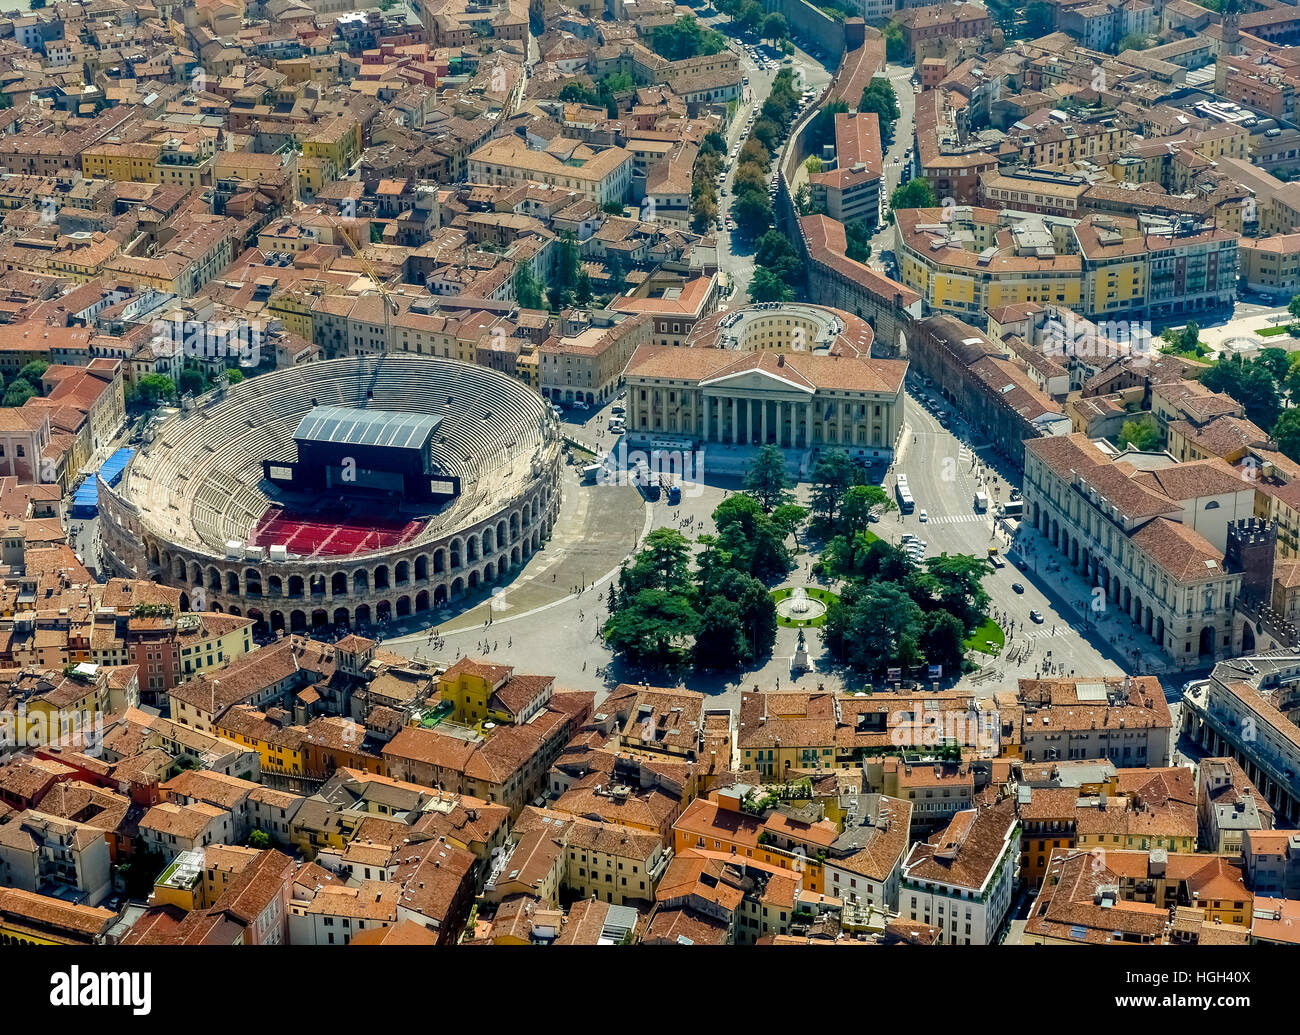 City centre with Palazzo Barbieri and Arena di Verona, Province of Verona, Veneto, Italy - Stock Image